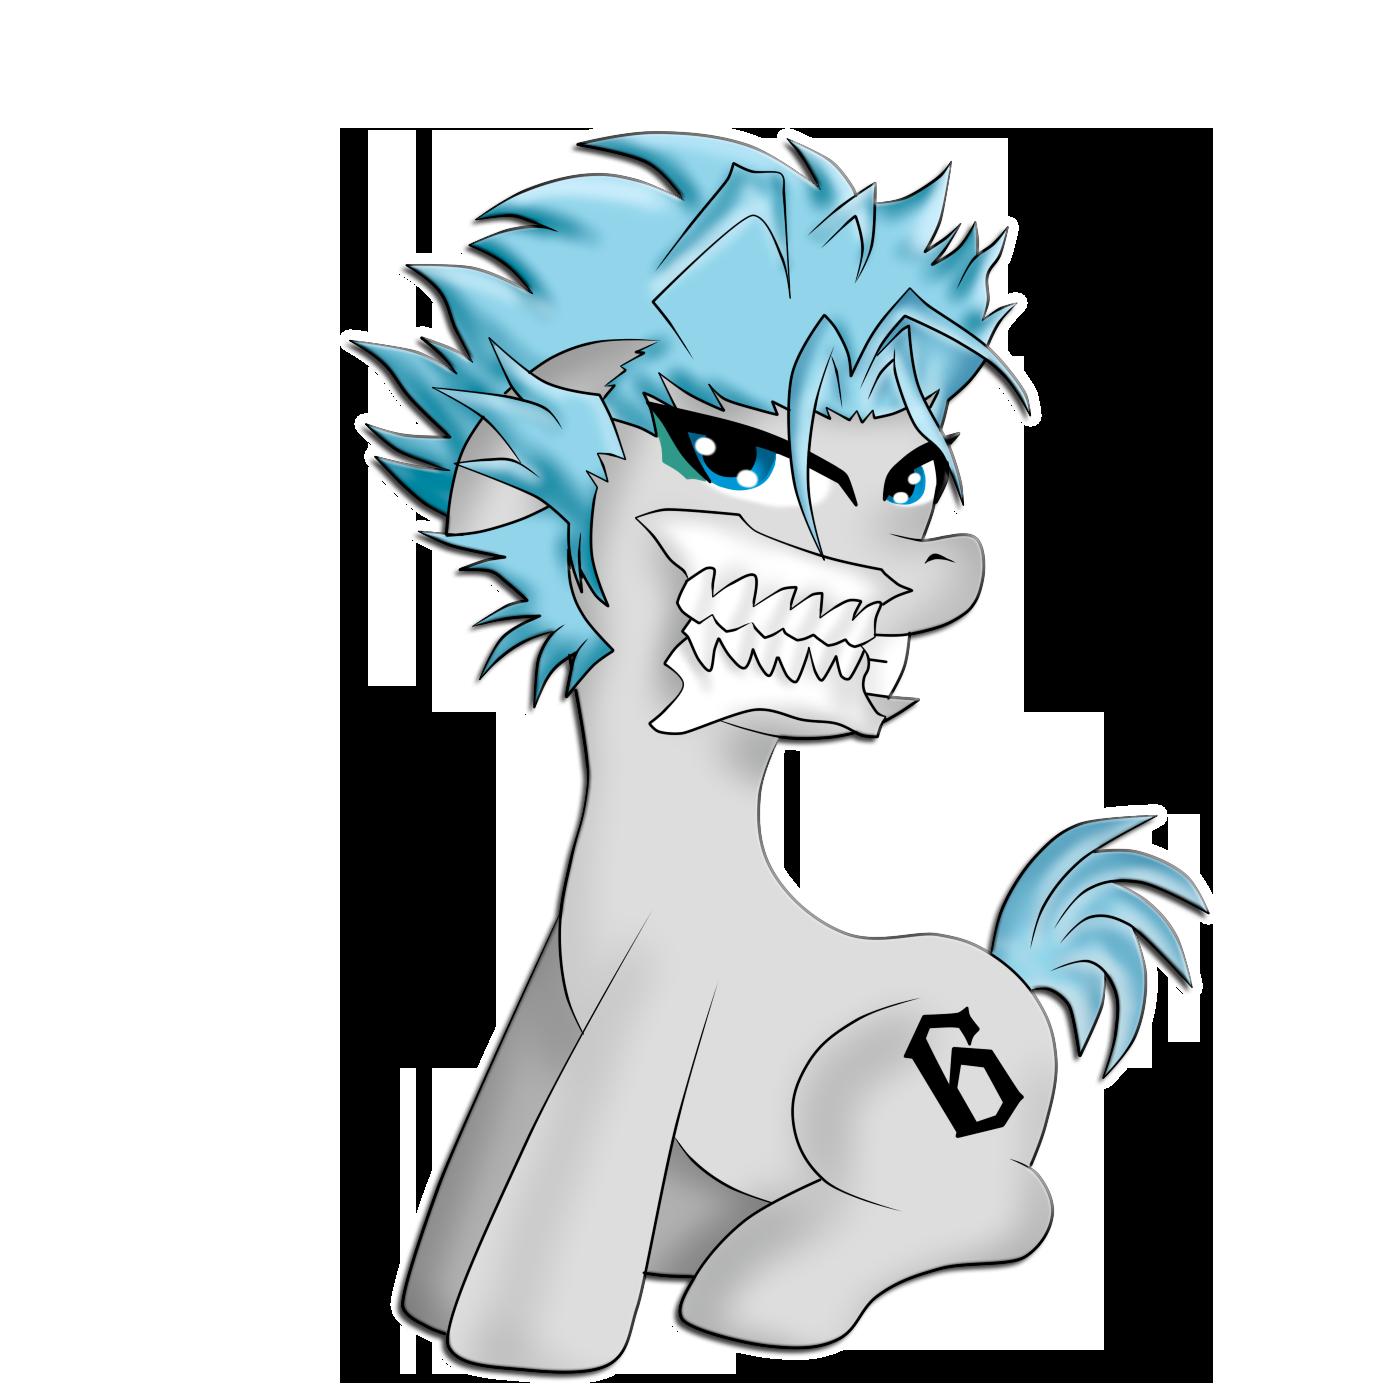 art request: pony grimmjow